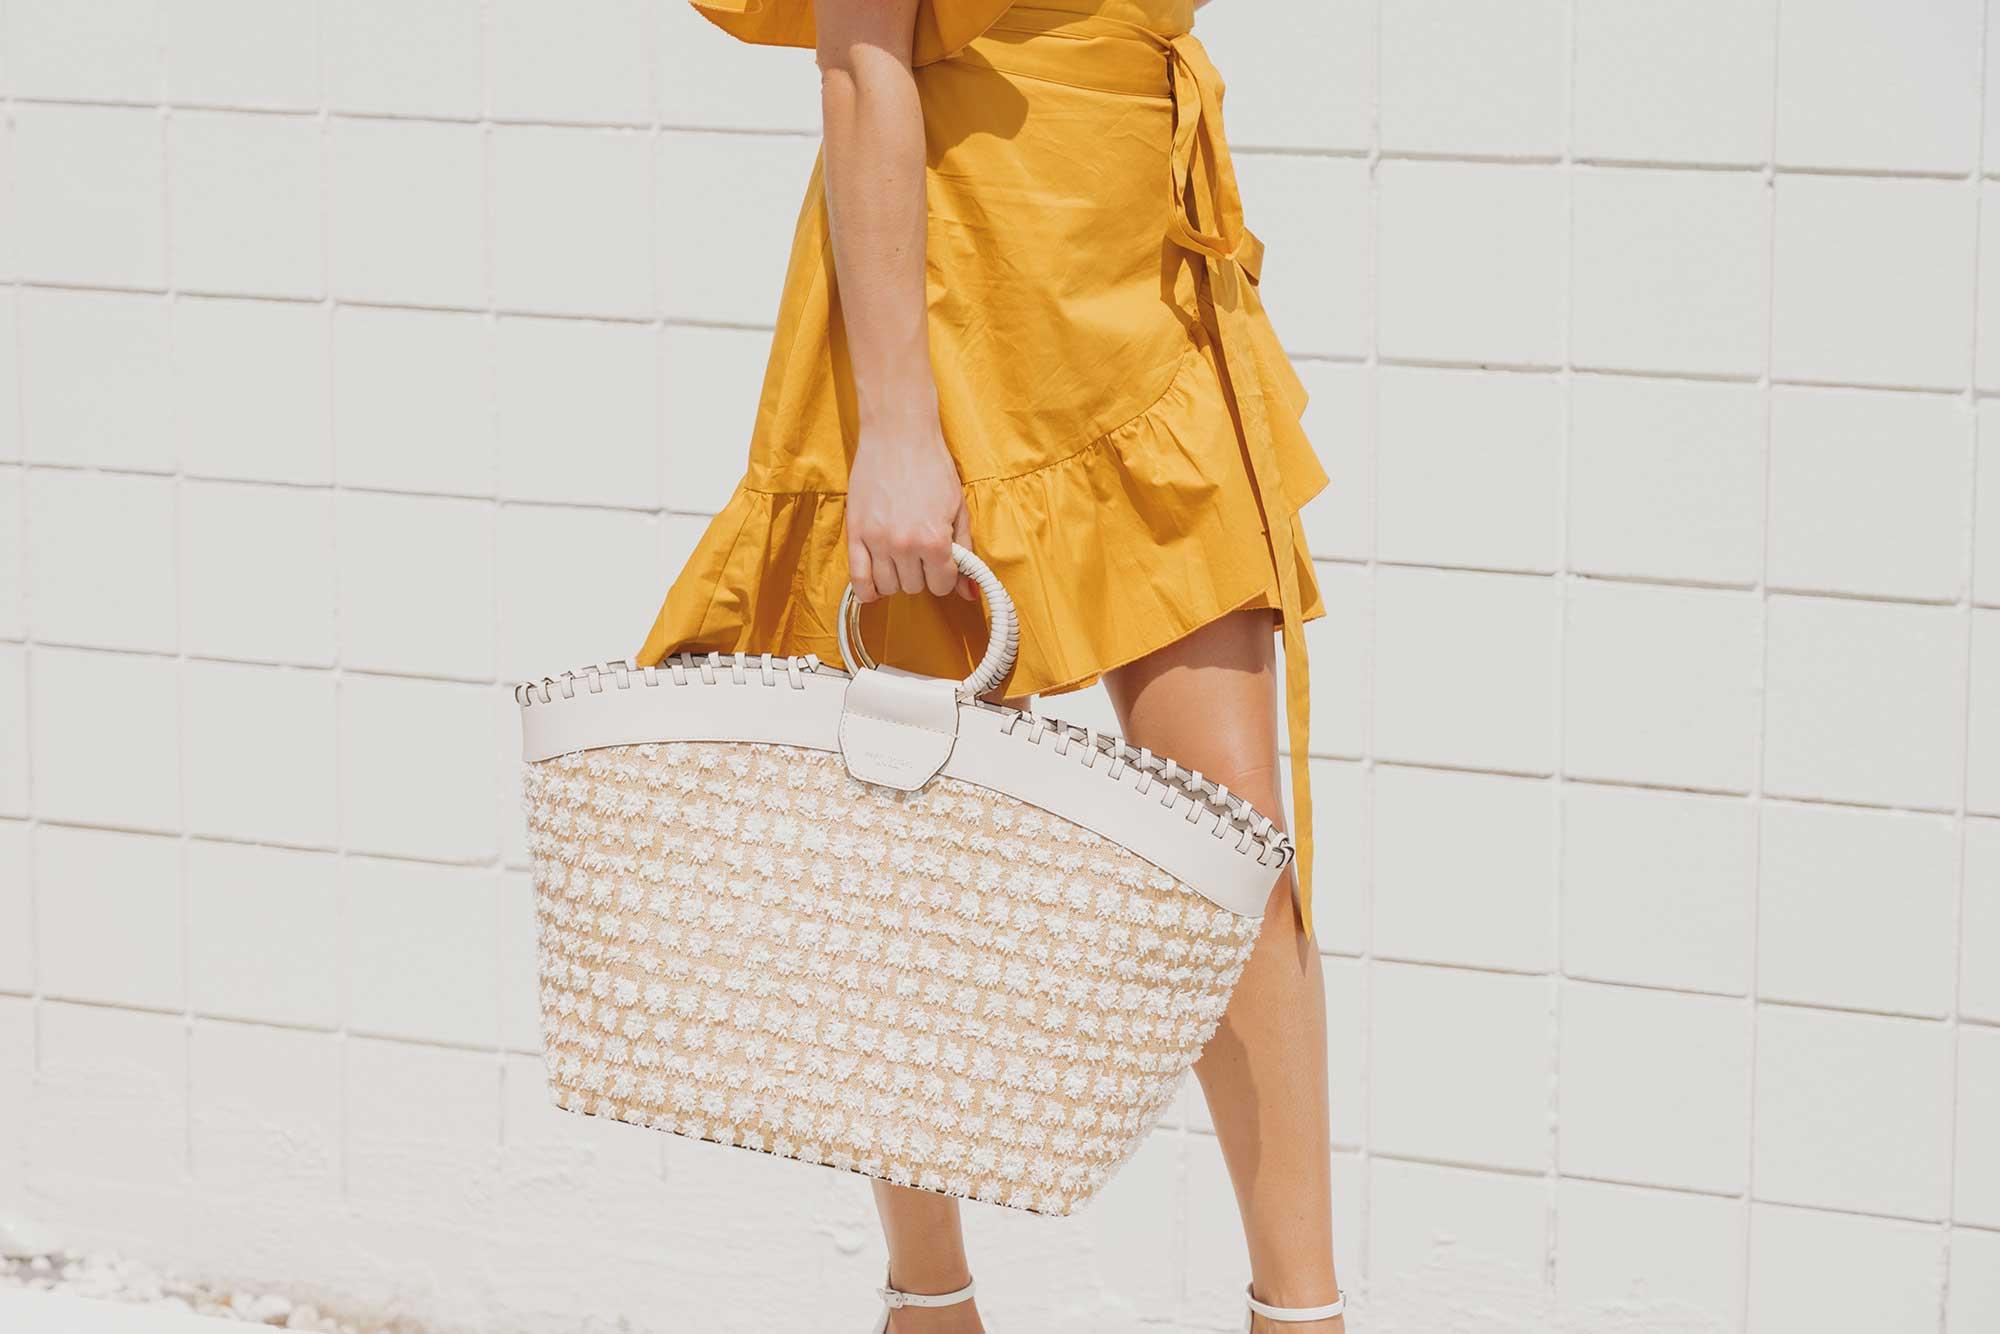 Cynthia Rowley Short sleeve cotton ruffle wrap dress Palm Springs Outfit10.jpg